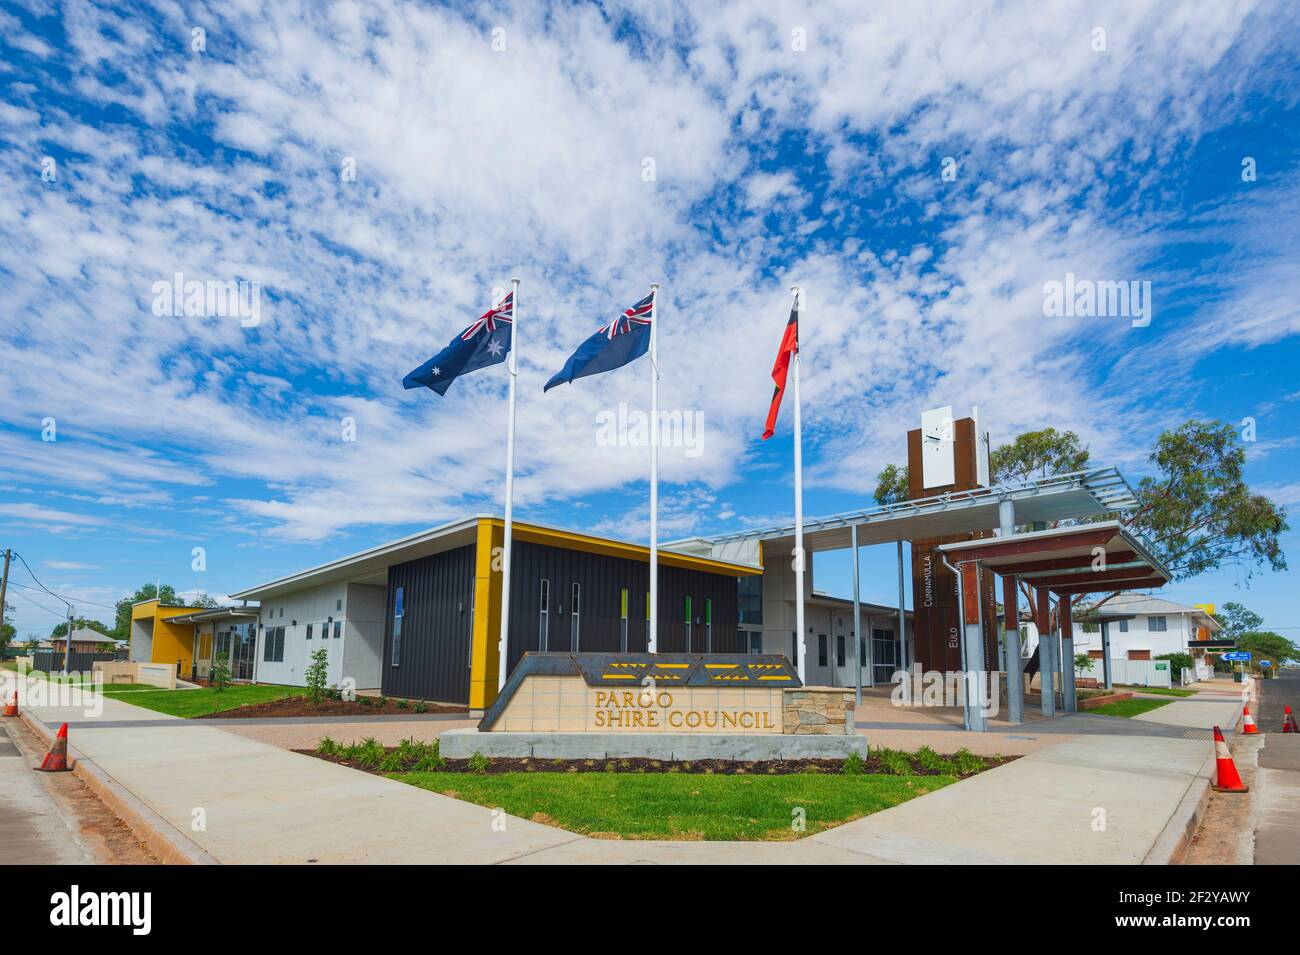 Blick auf das Paroo Shire Council Gebäude in Cunnamulla, Cunnamulla, Queensland, QLD, Australien Stockfoto